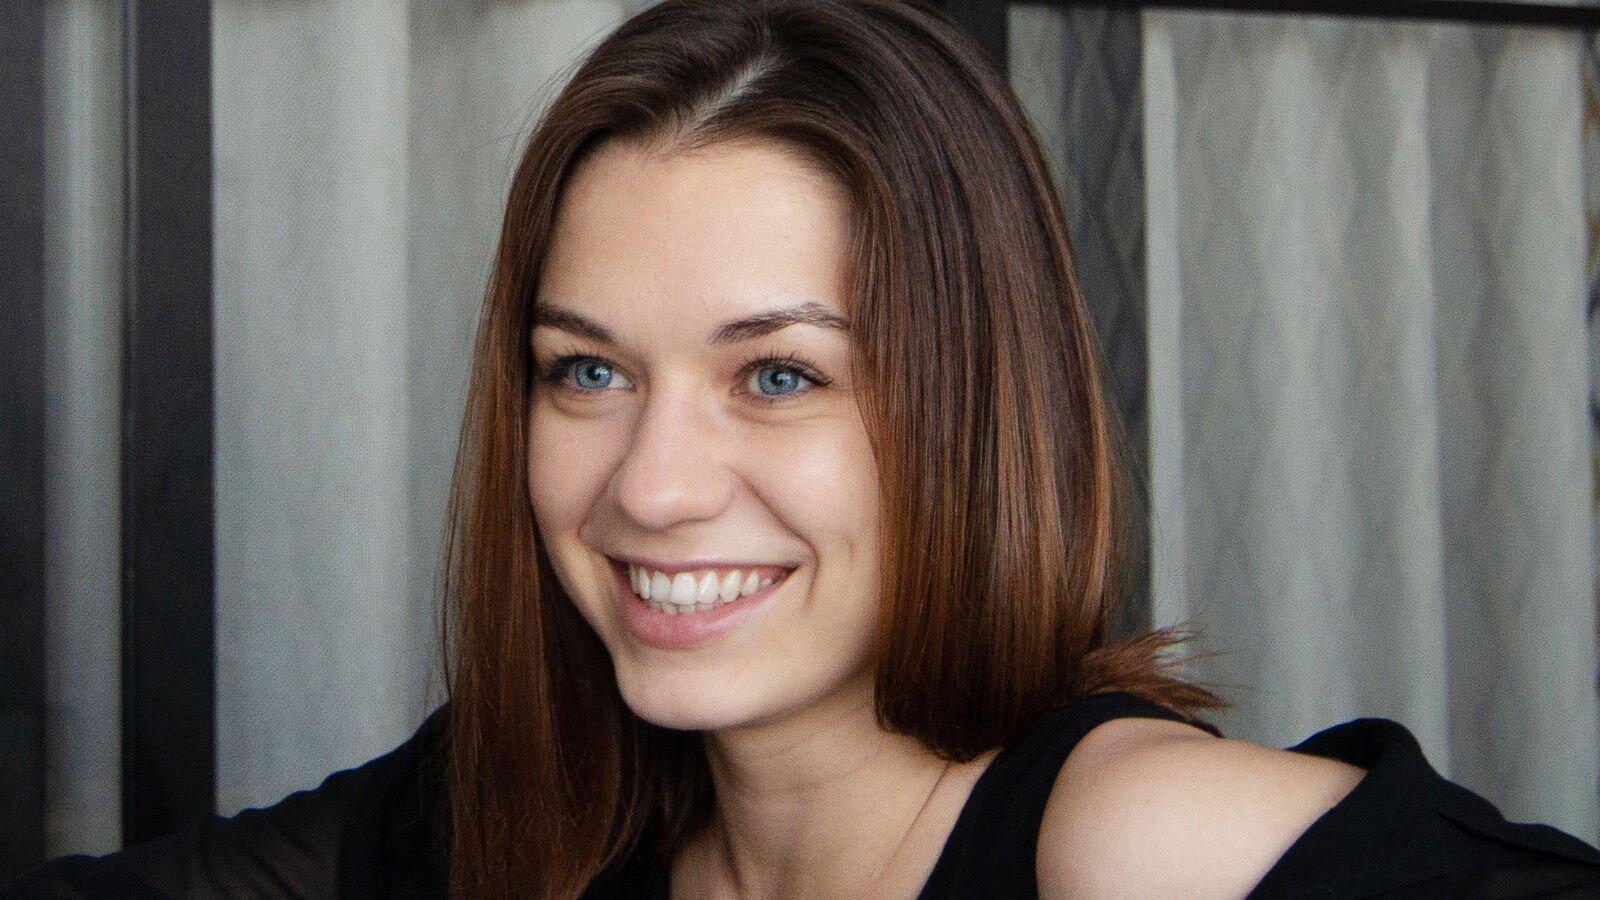 ChloeMisol